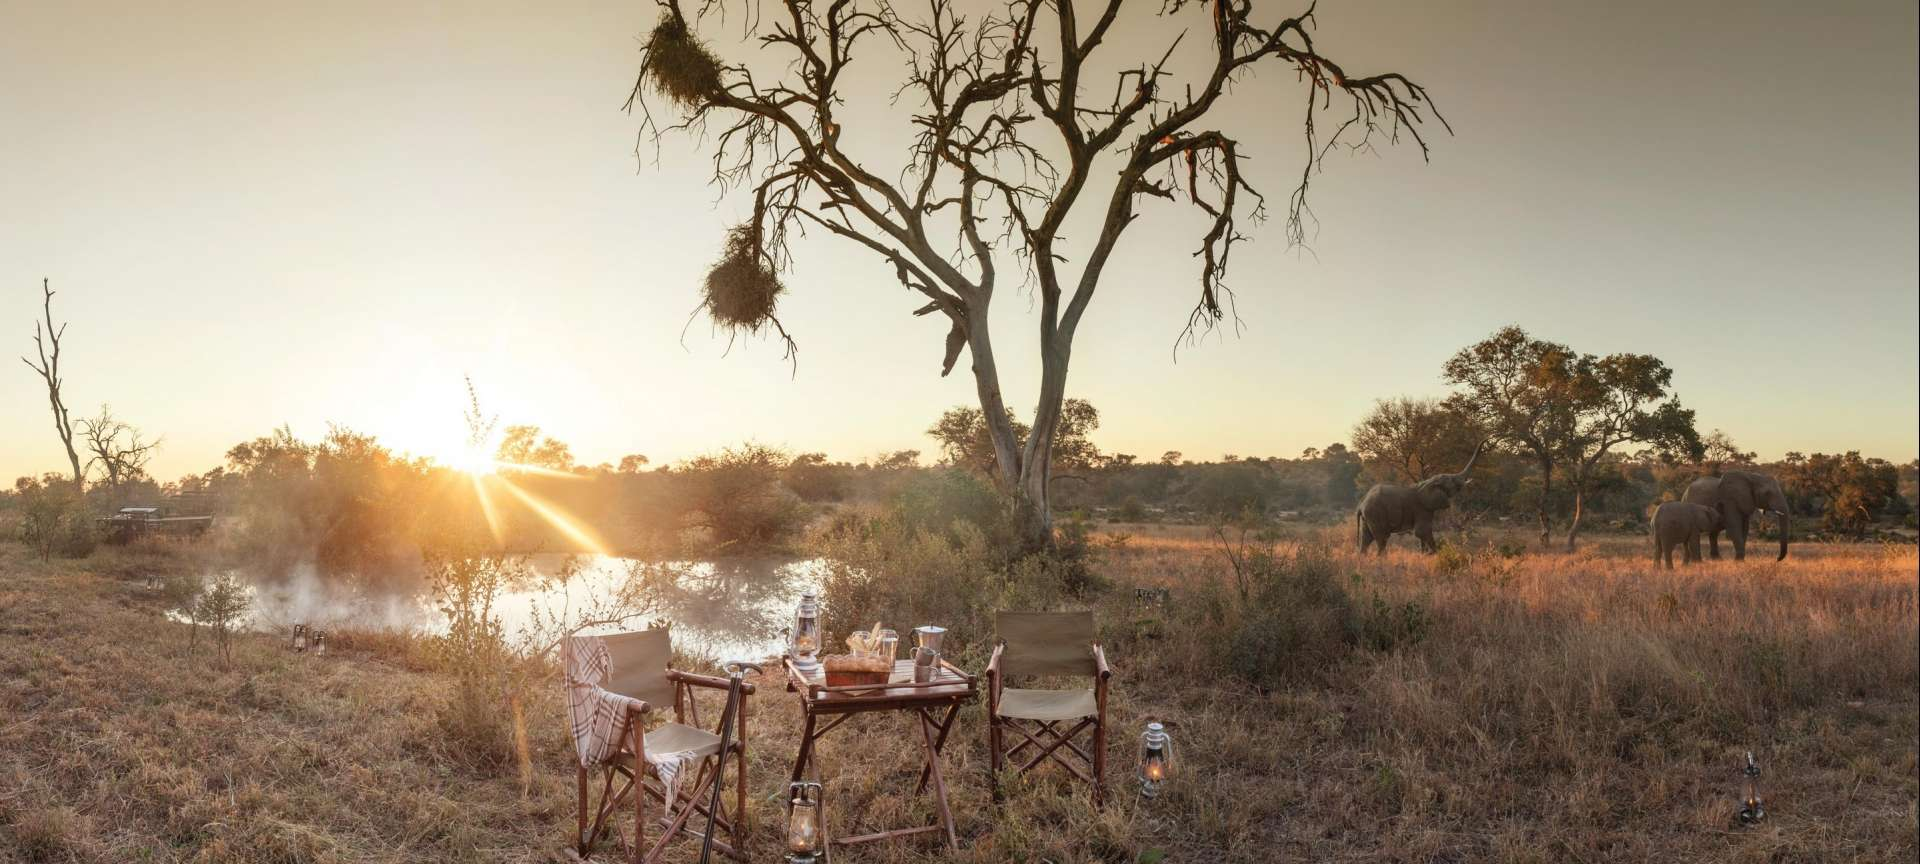 Timbavati Game Reserve - Africa Wildlife Safaris